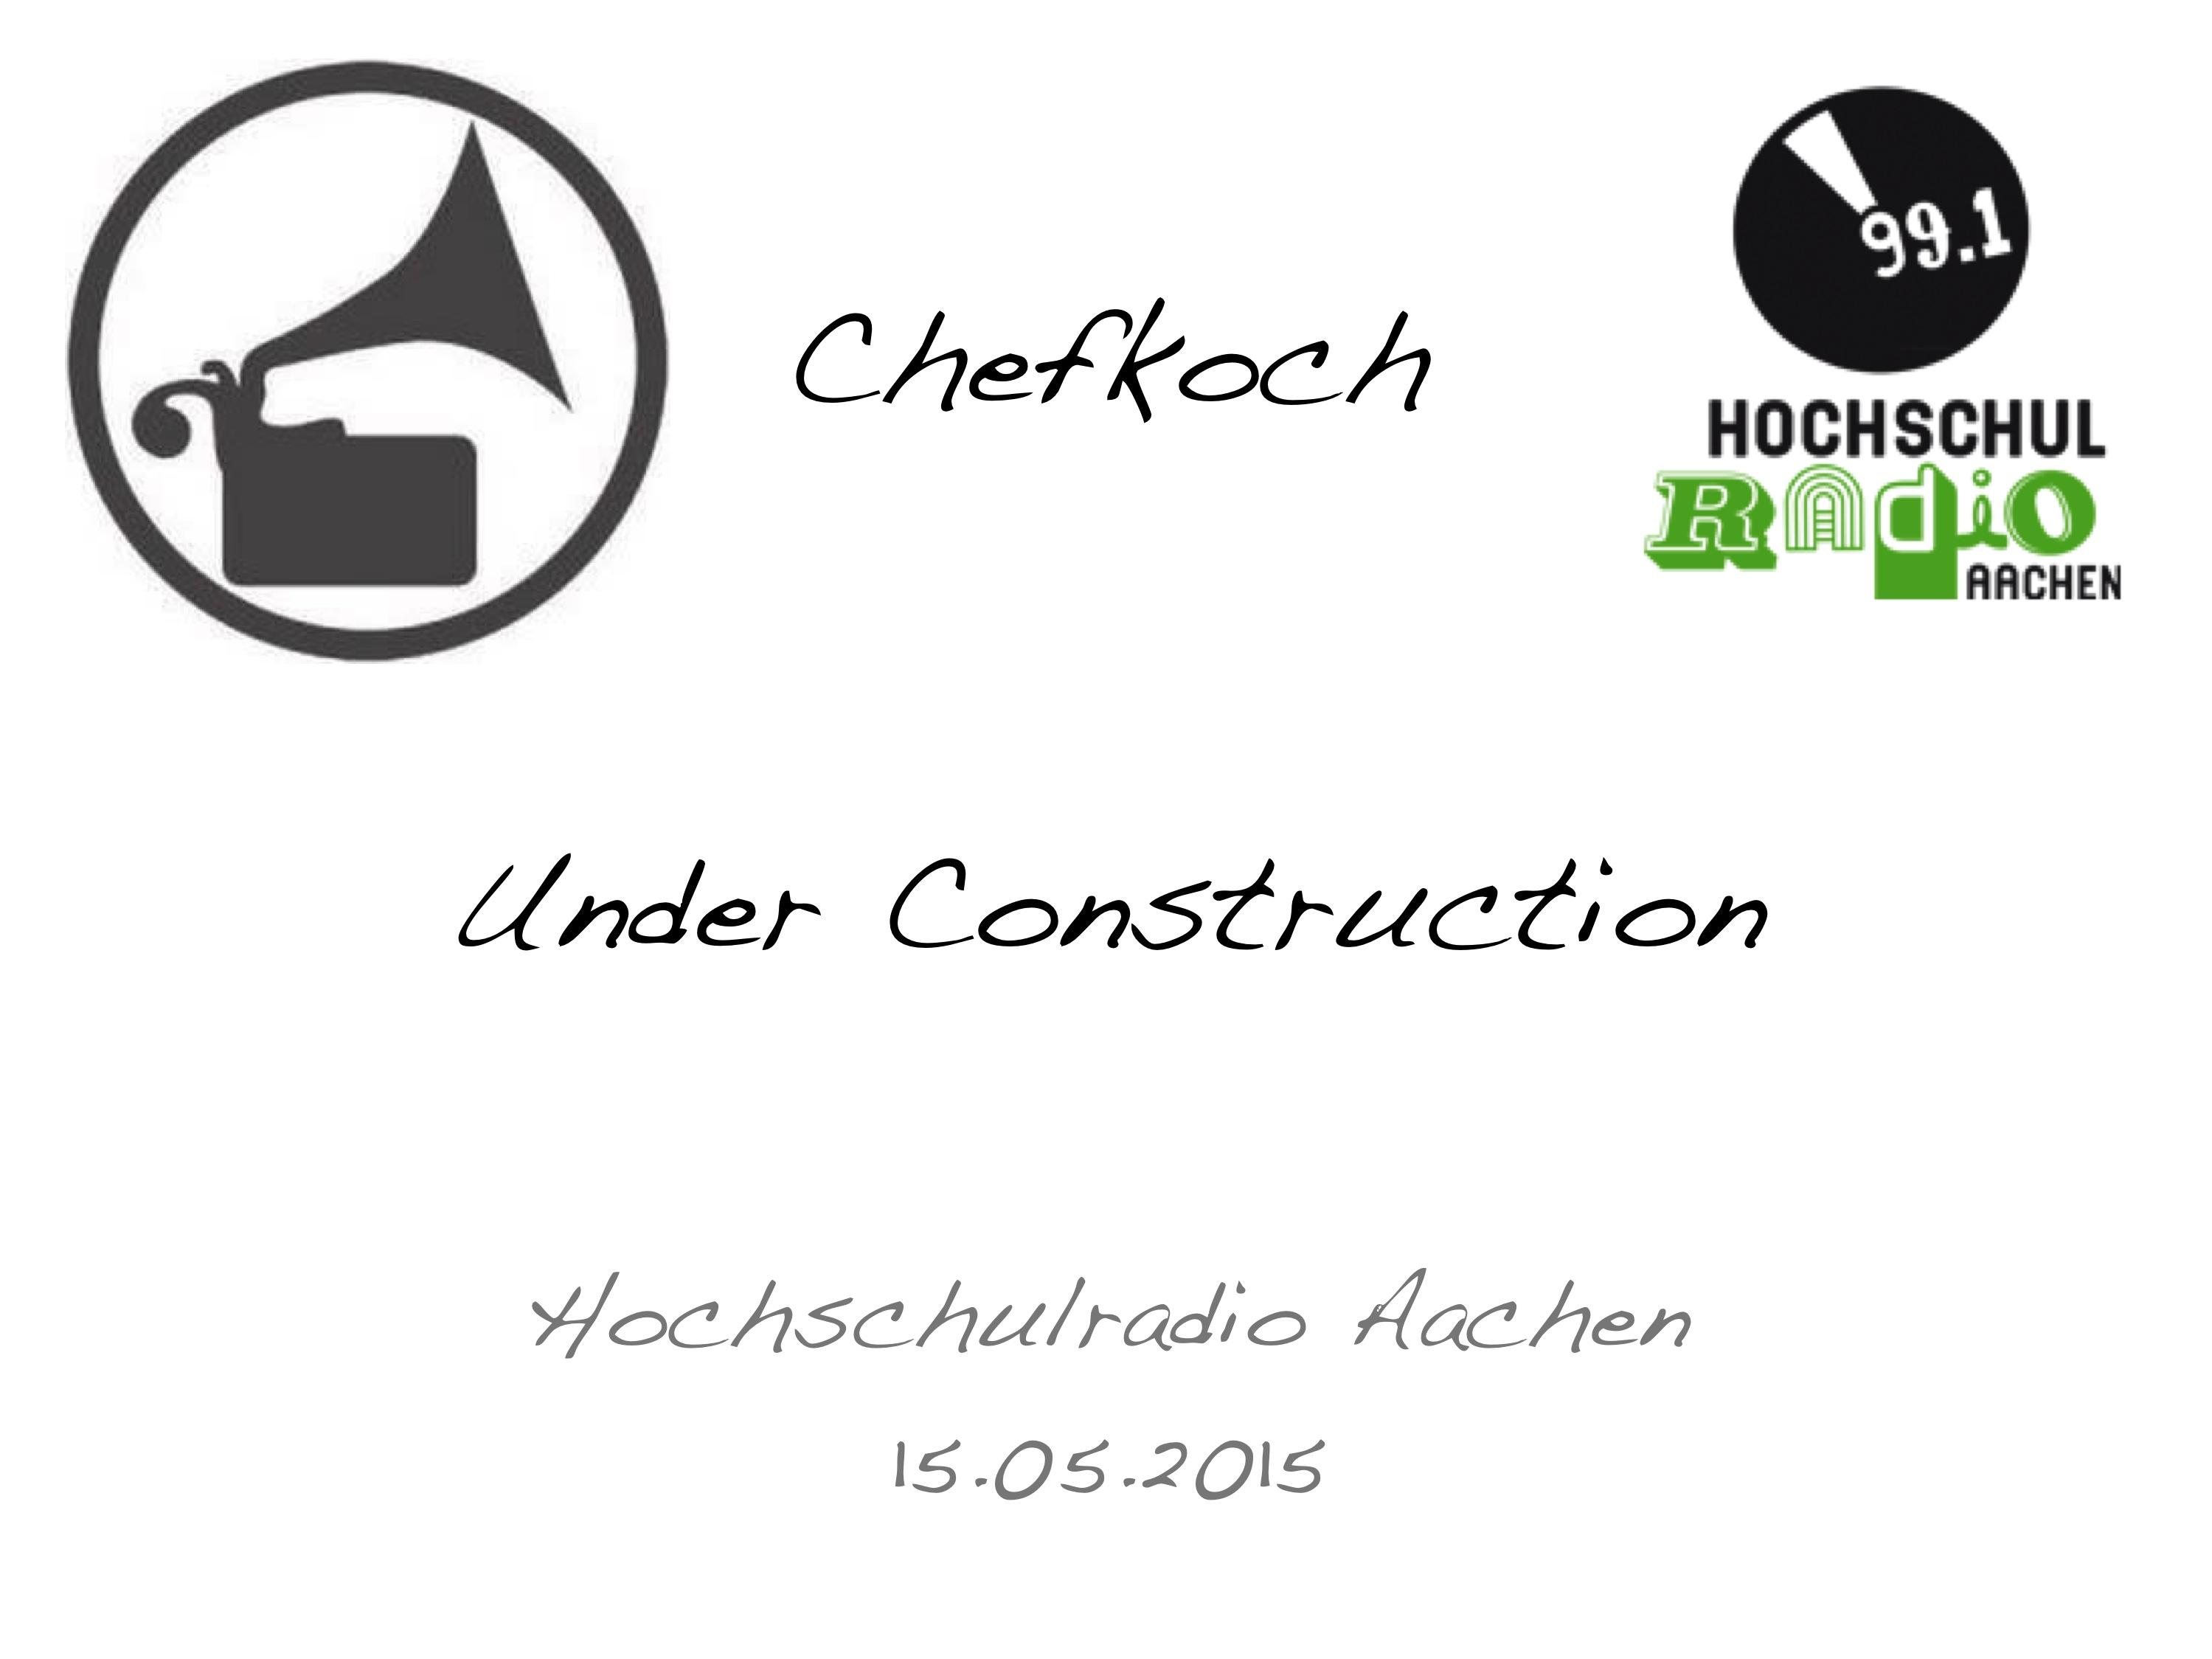 <!--:de-->Under Construction – Hochschulradio Aachen 15.05.2015 – Chefkoch<!--:--><!--:en-->Under Construction – Hochschulradio Aachen 15.05.2015 – Chefkoch<!--:-->